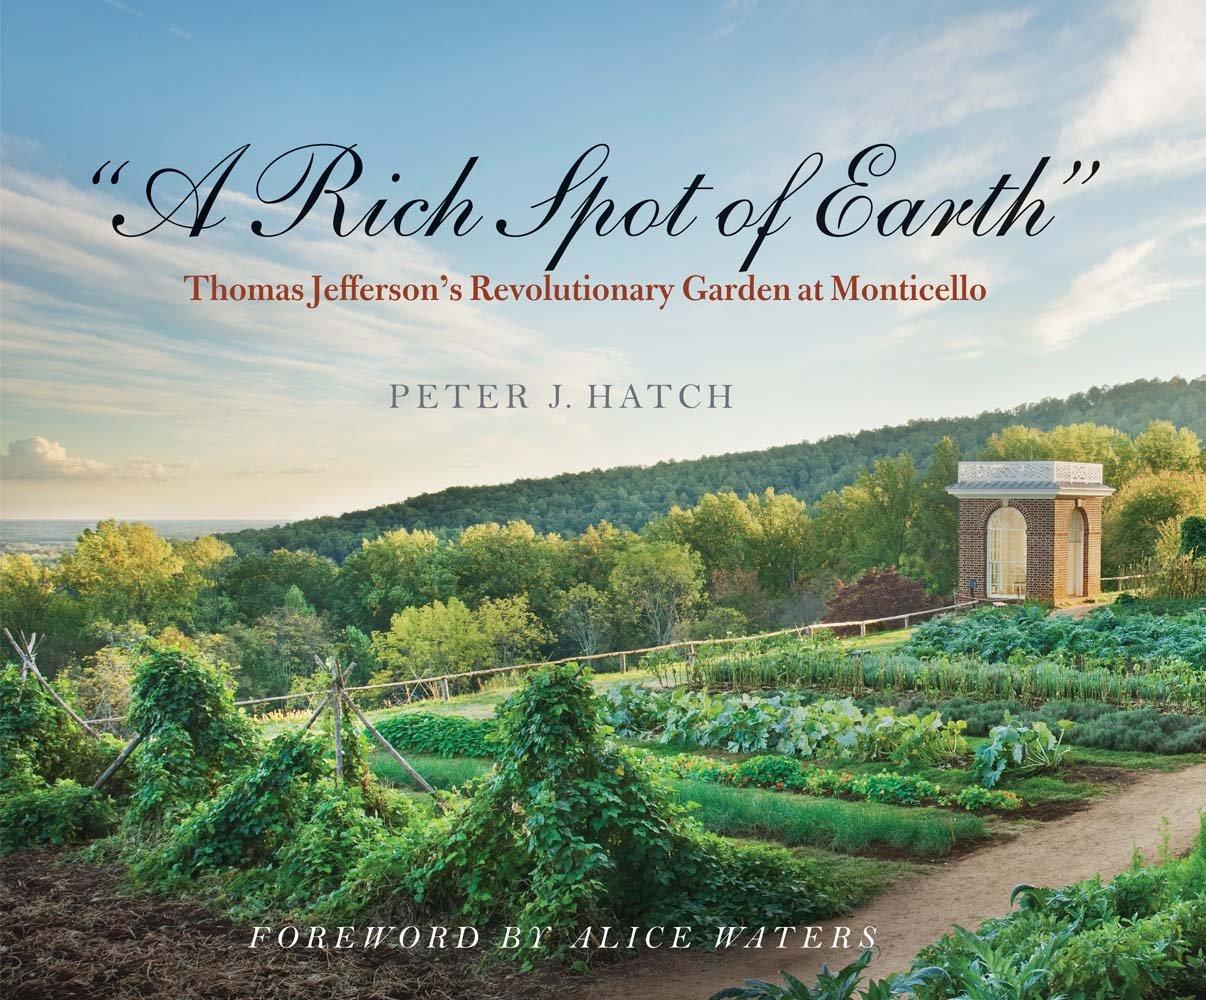 ''A Rich Spot of Earth'': Thomas Jefferson's Revolutionary Garden at Monticello